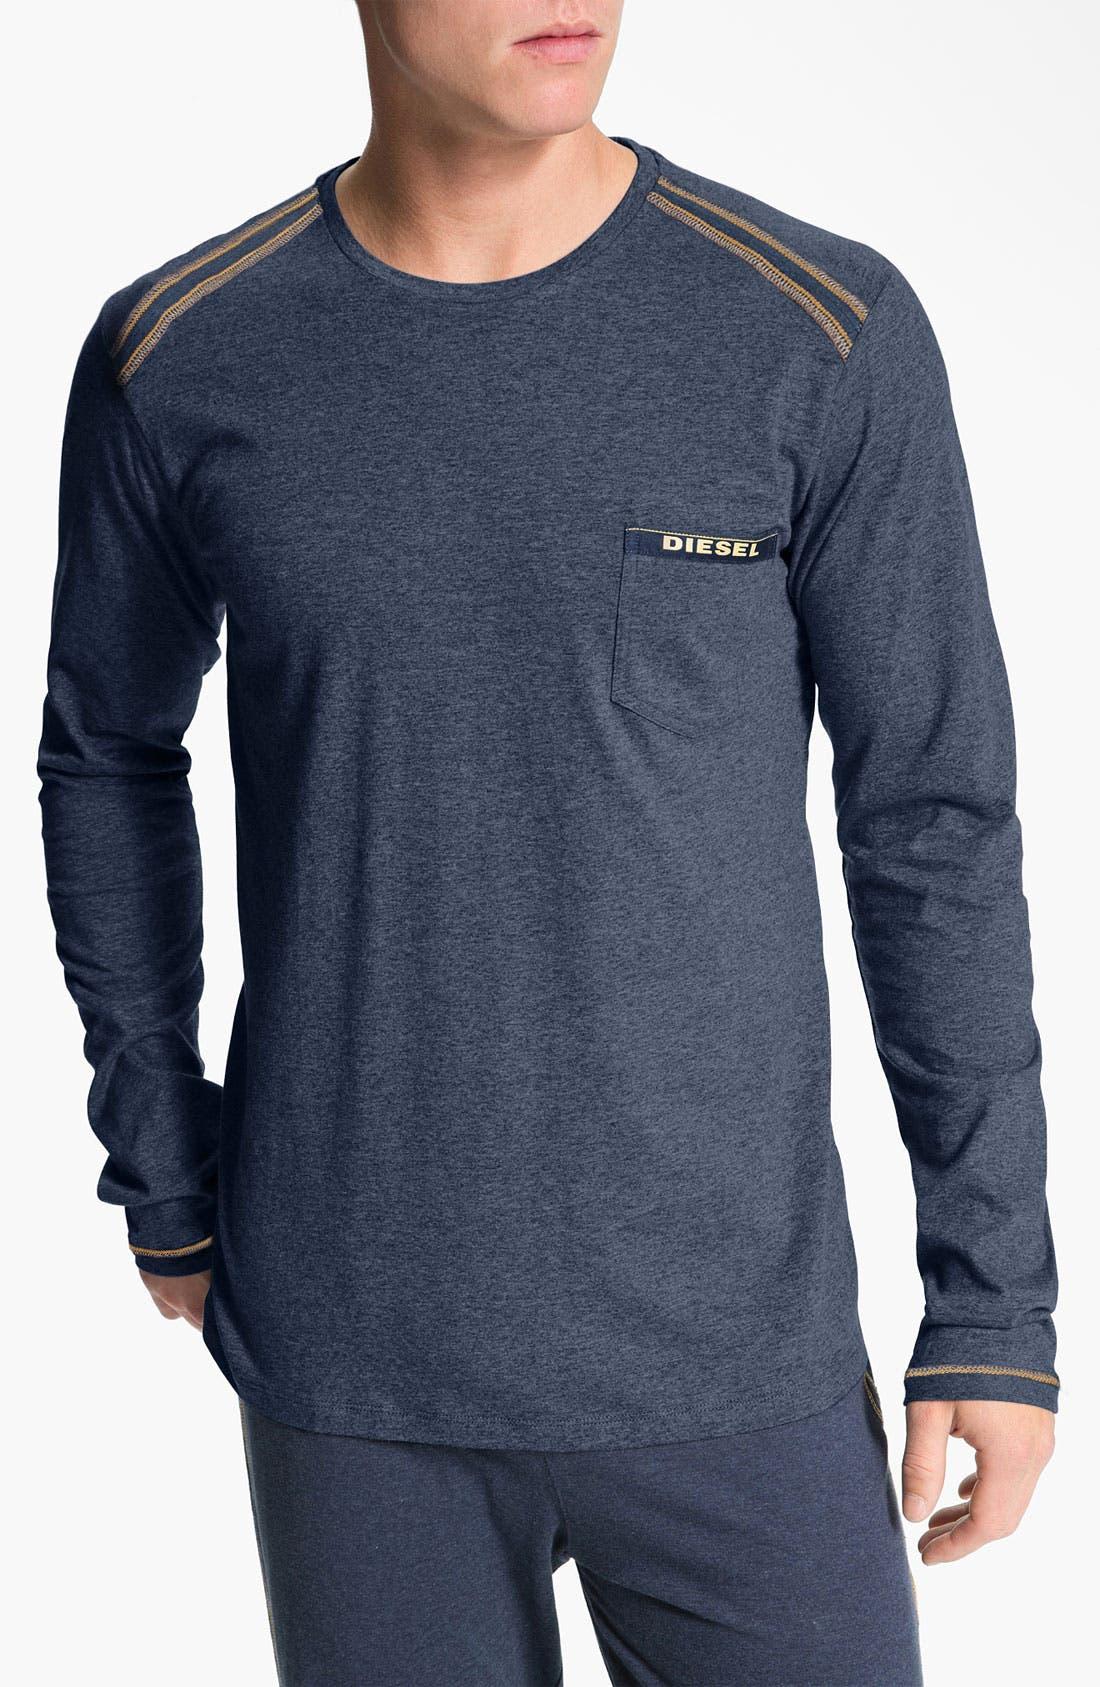 Main Image - DIESEL® 'Justin' Long Sleeve T-Shirt